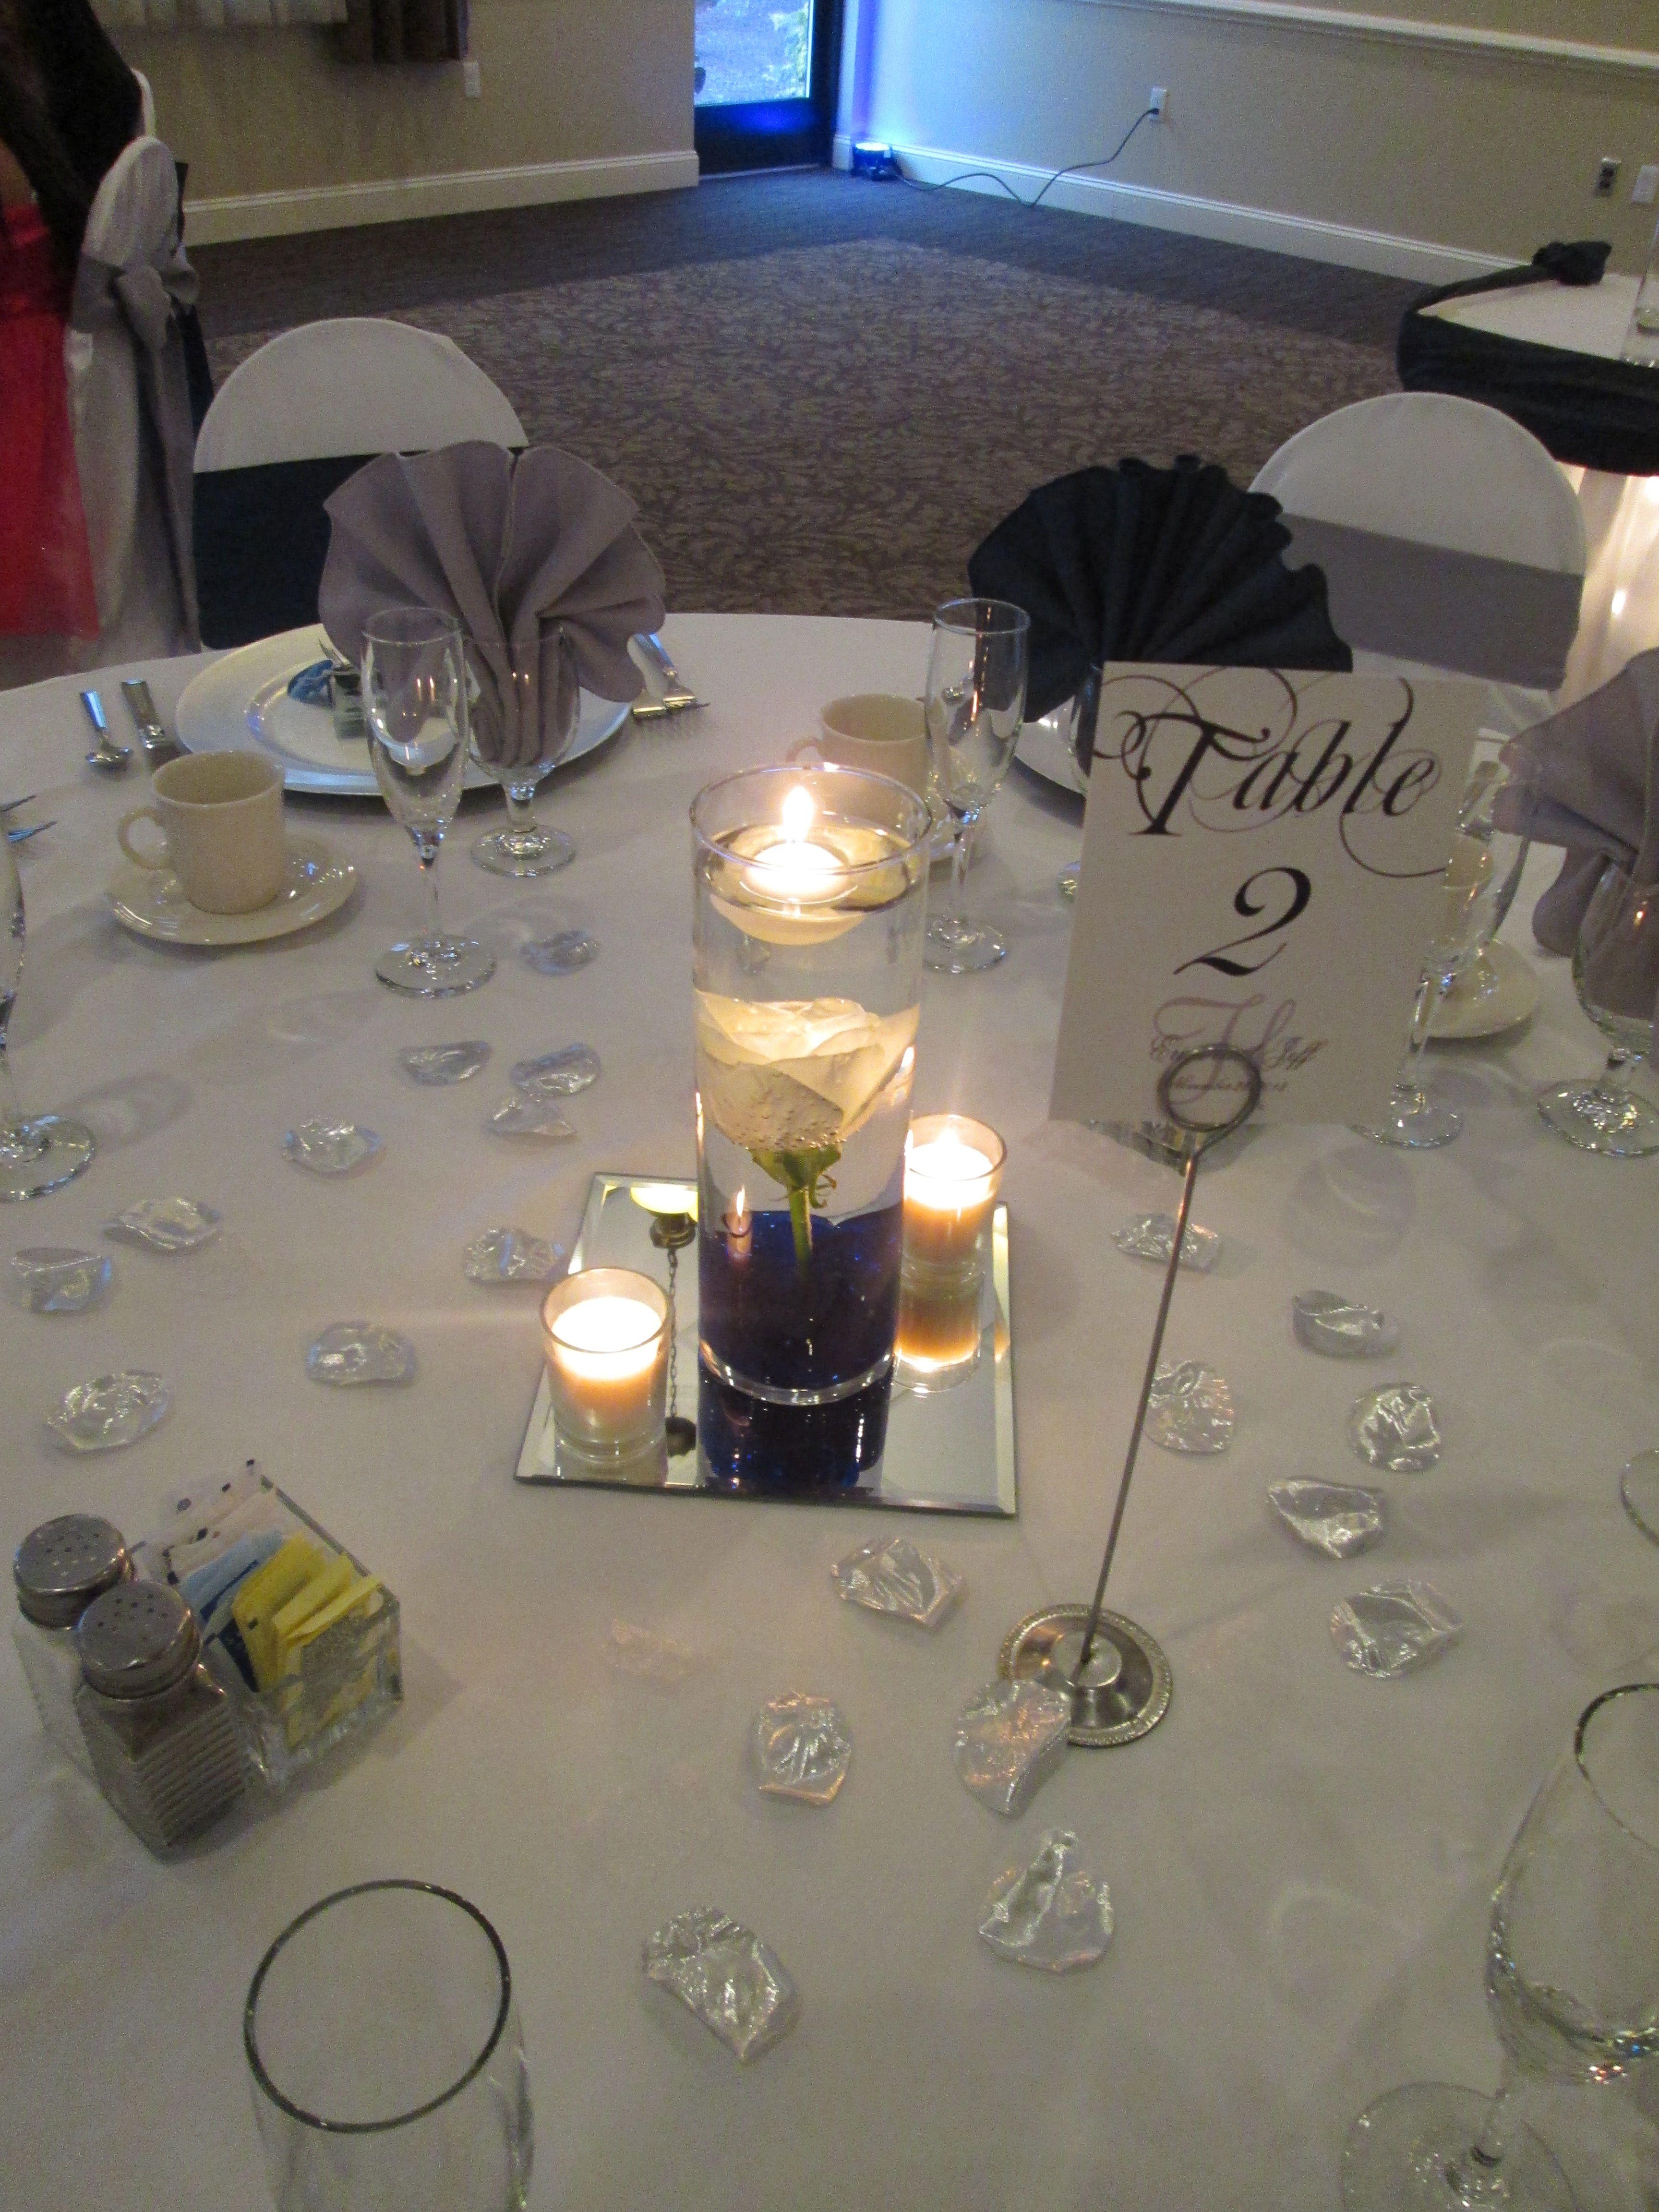 Medium size vase with floating candles centerpiece #caprottiscatering #capriottispalazzo #wedding #centerpiece